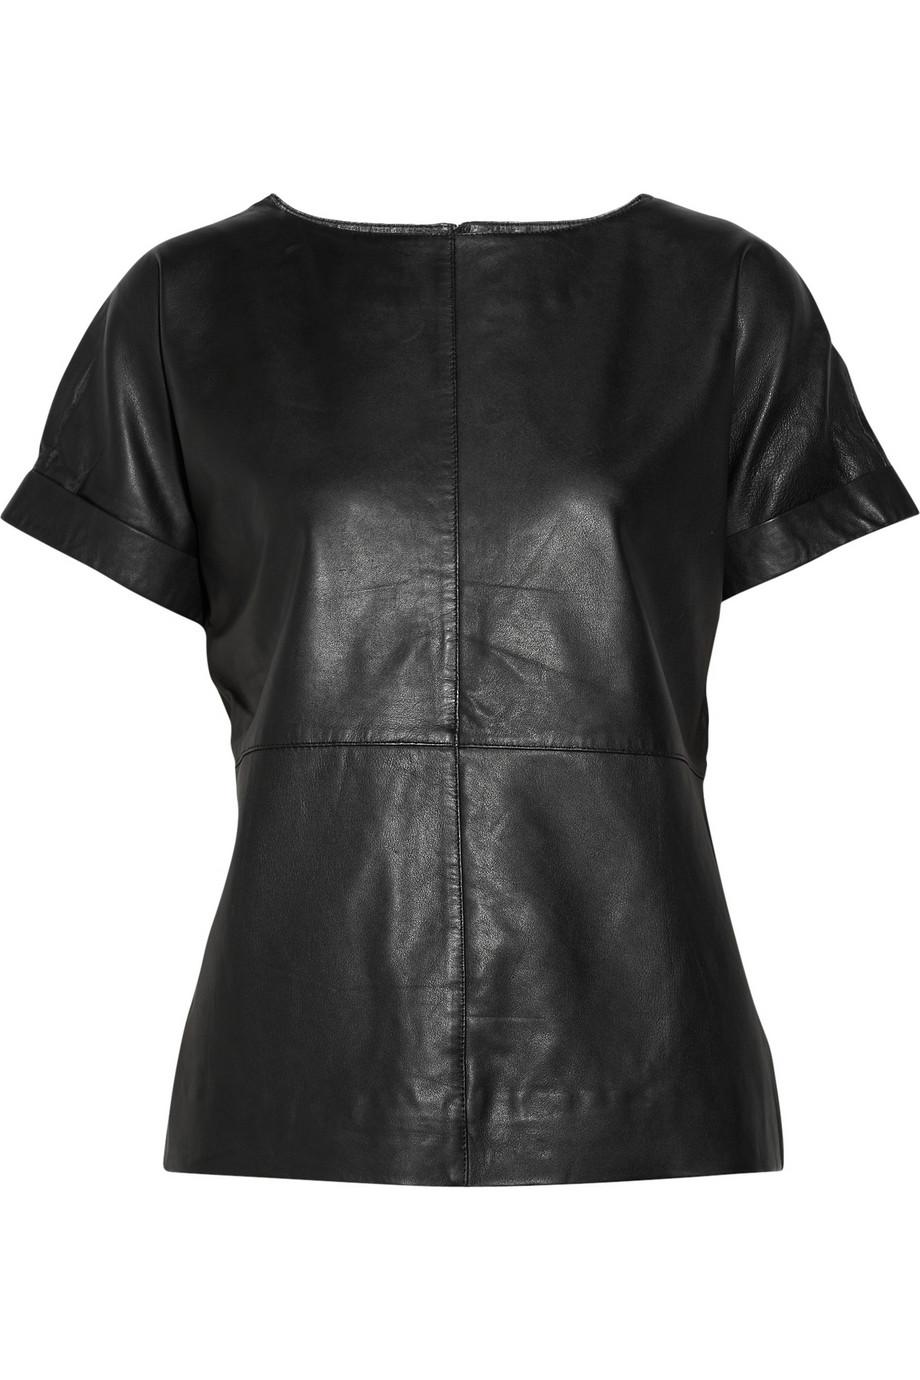 Sara Berman Zoe Leather Top in Black - Lyst